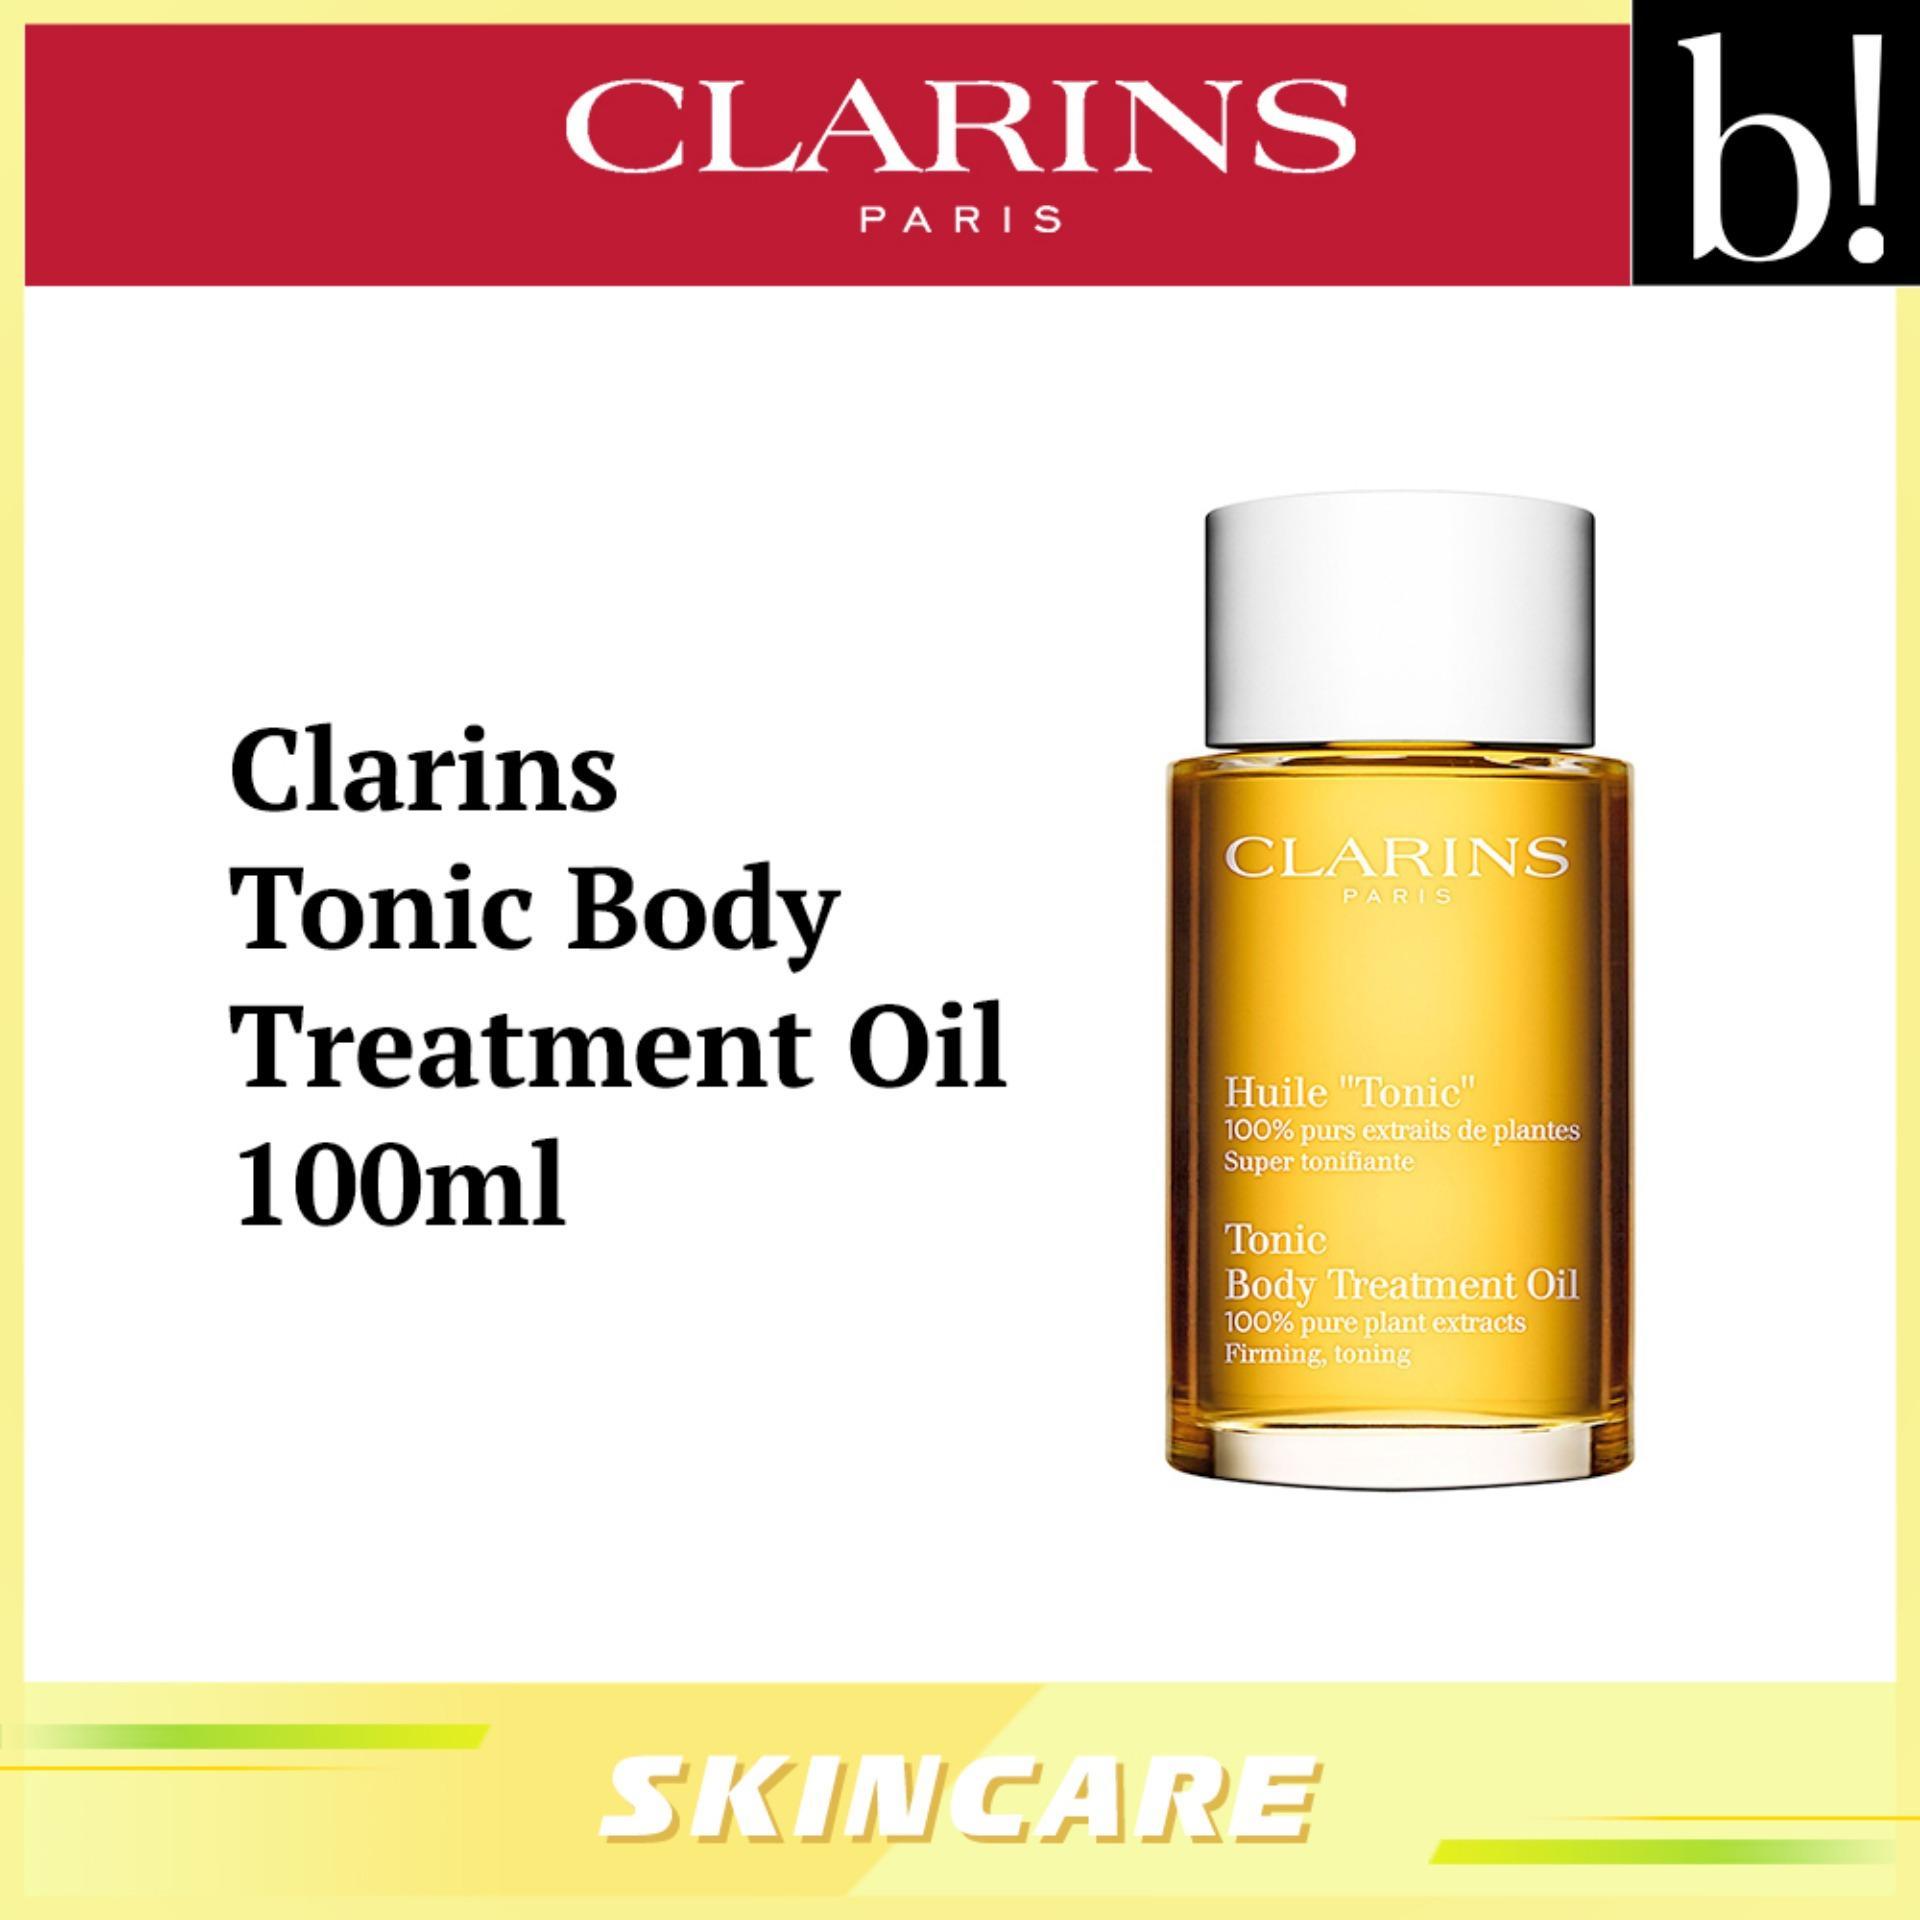 Clarins Tonic Body Treatment Oil 100ml - Beureka